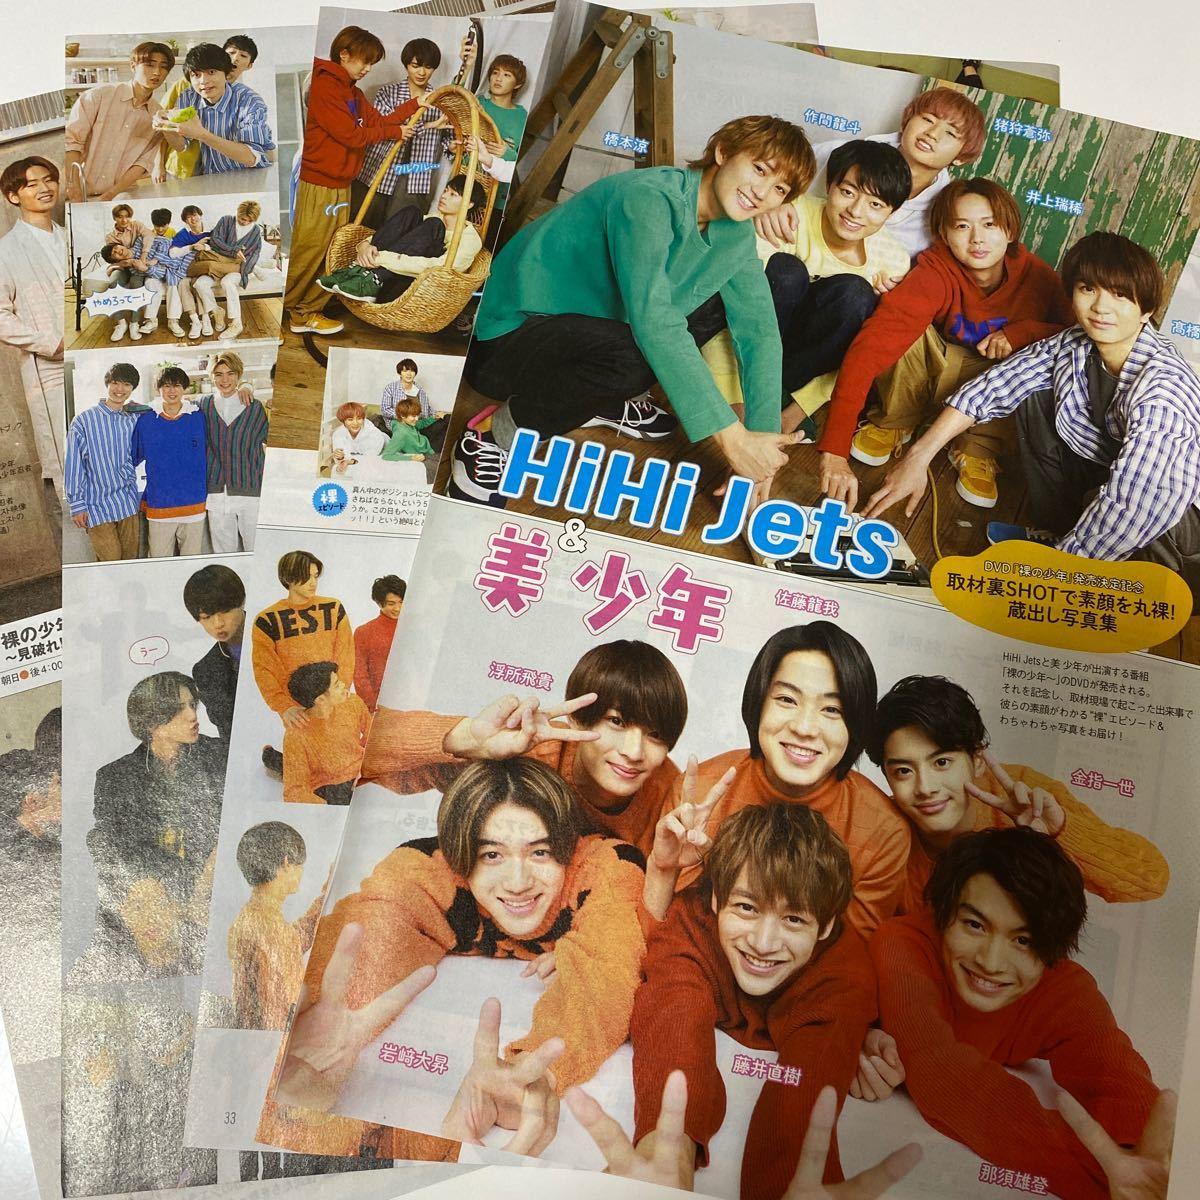 TVガイド 2020/5/26-7/1 HiHi Jets & 美 少年